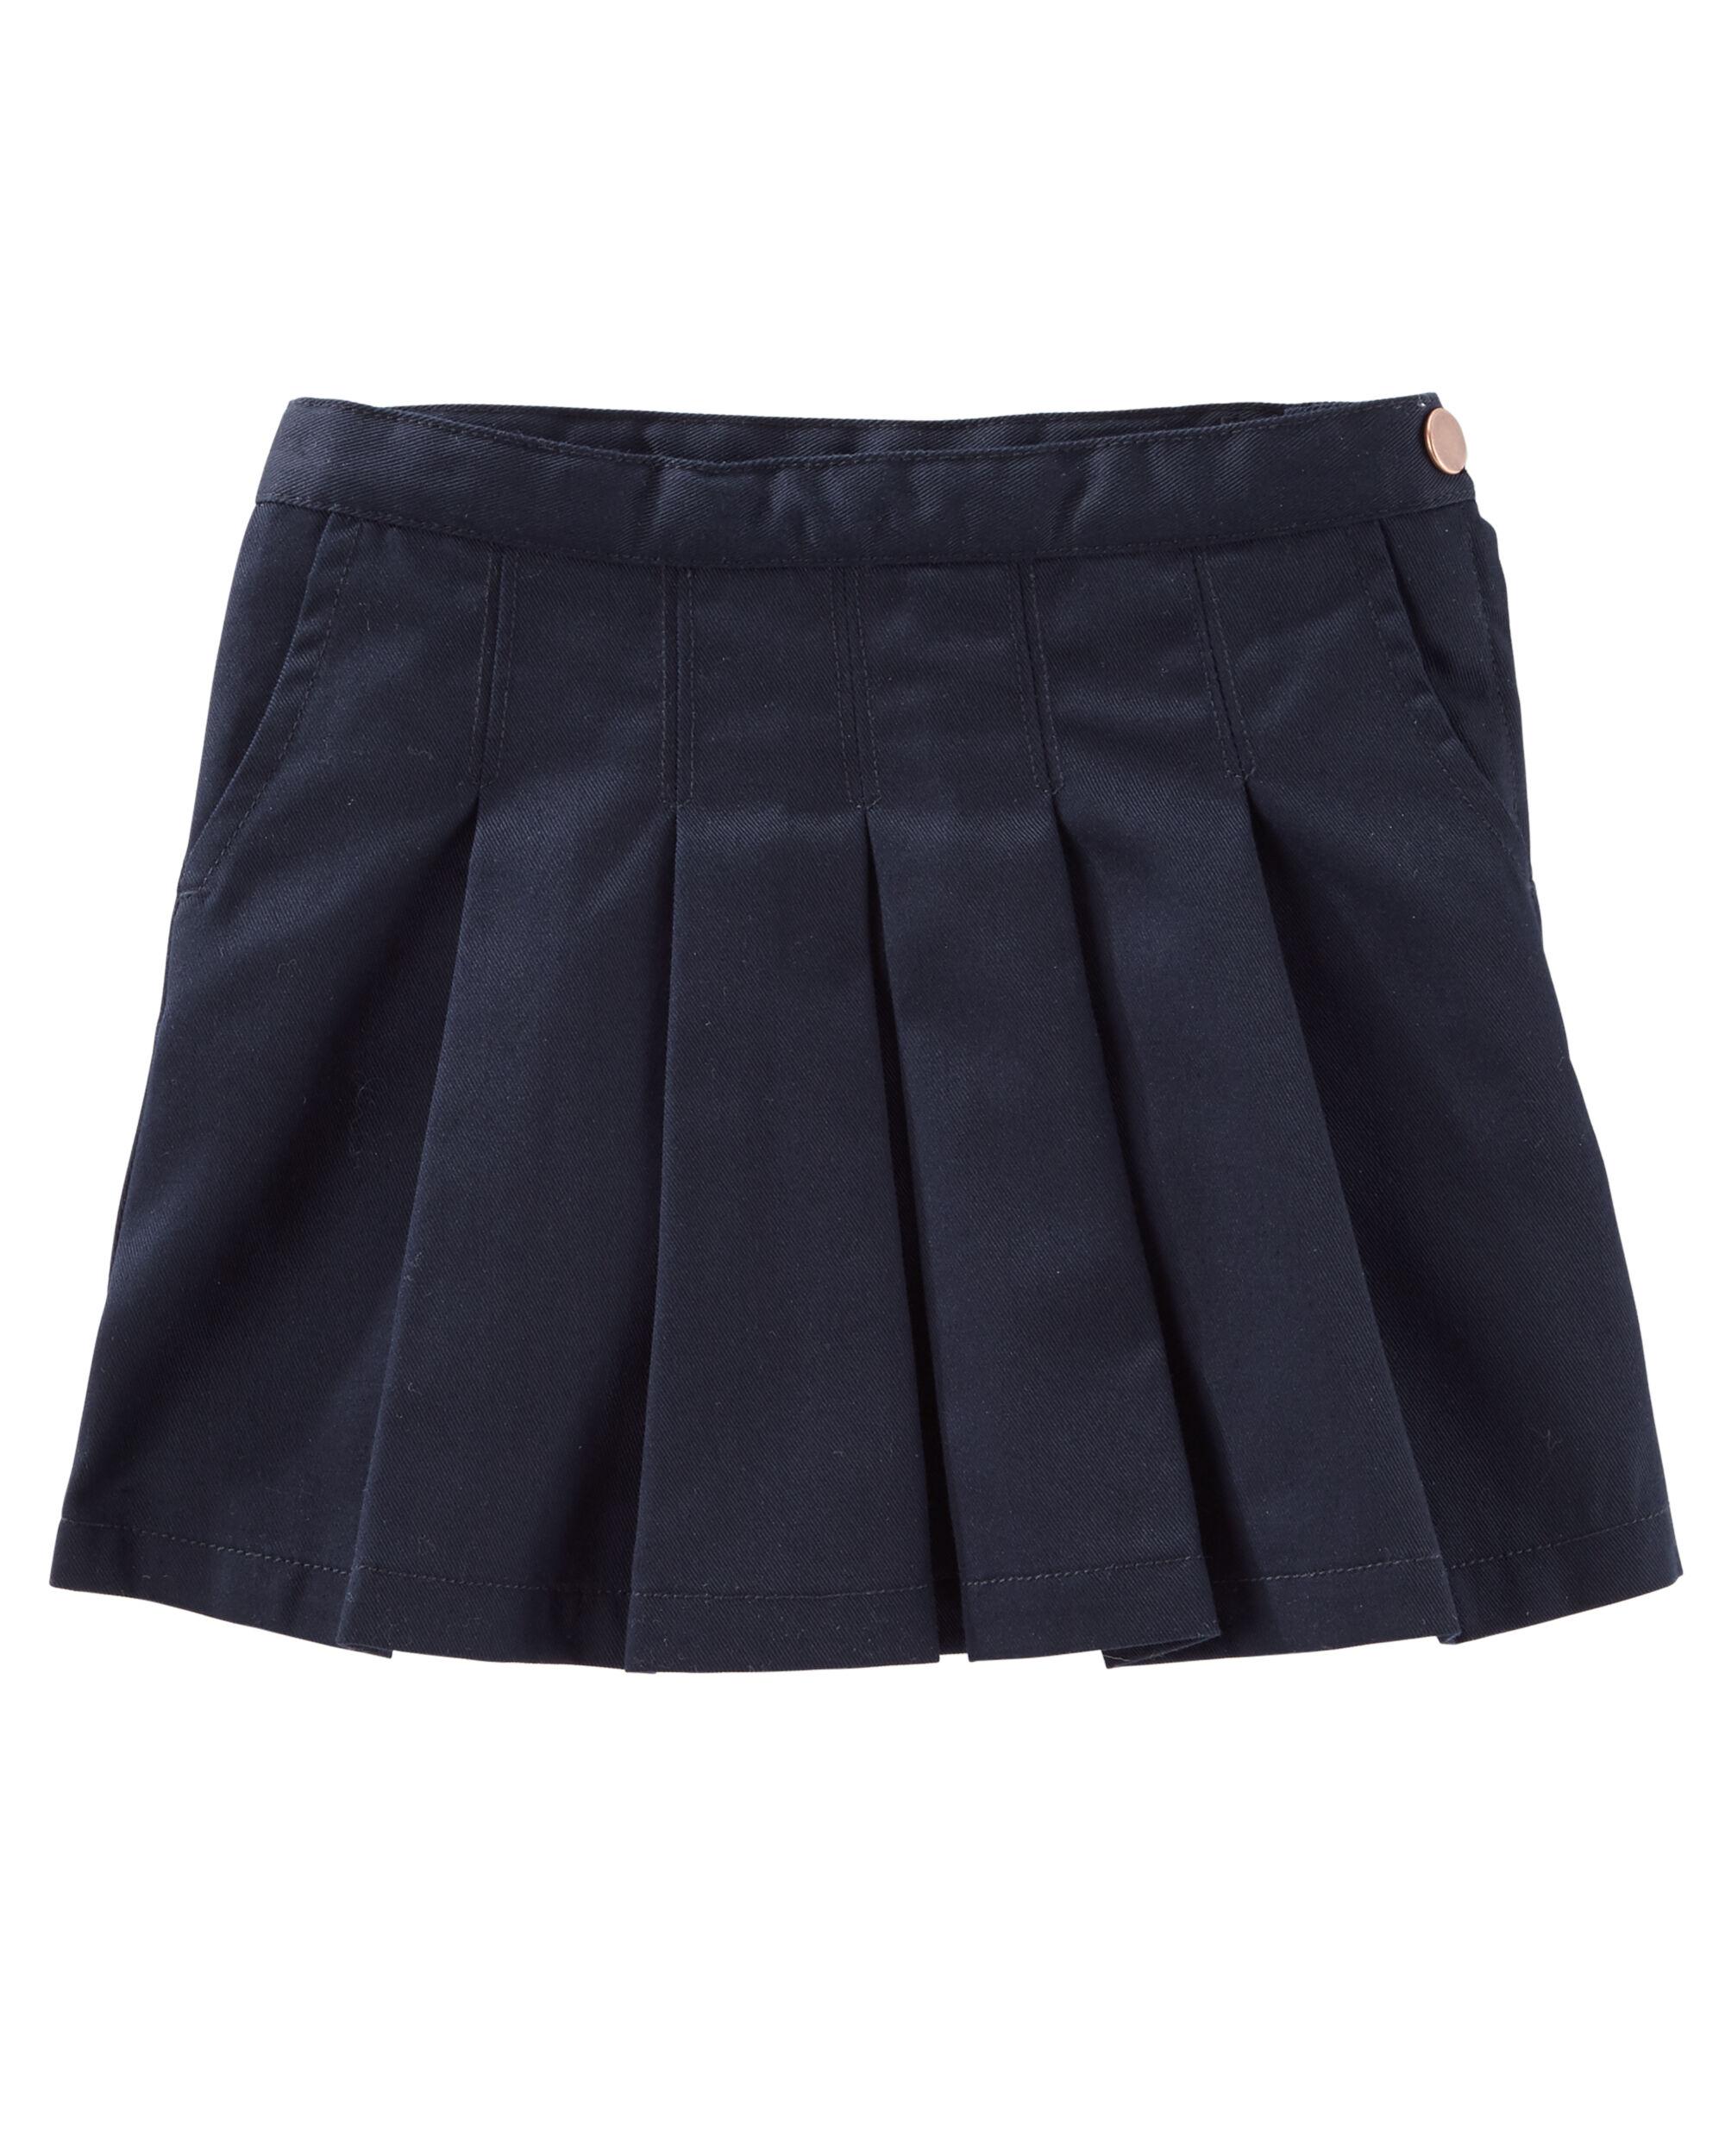 Osh Kosh Girls Kids Pleated Uniform Skirt